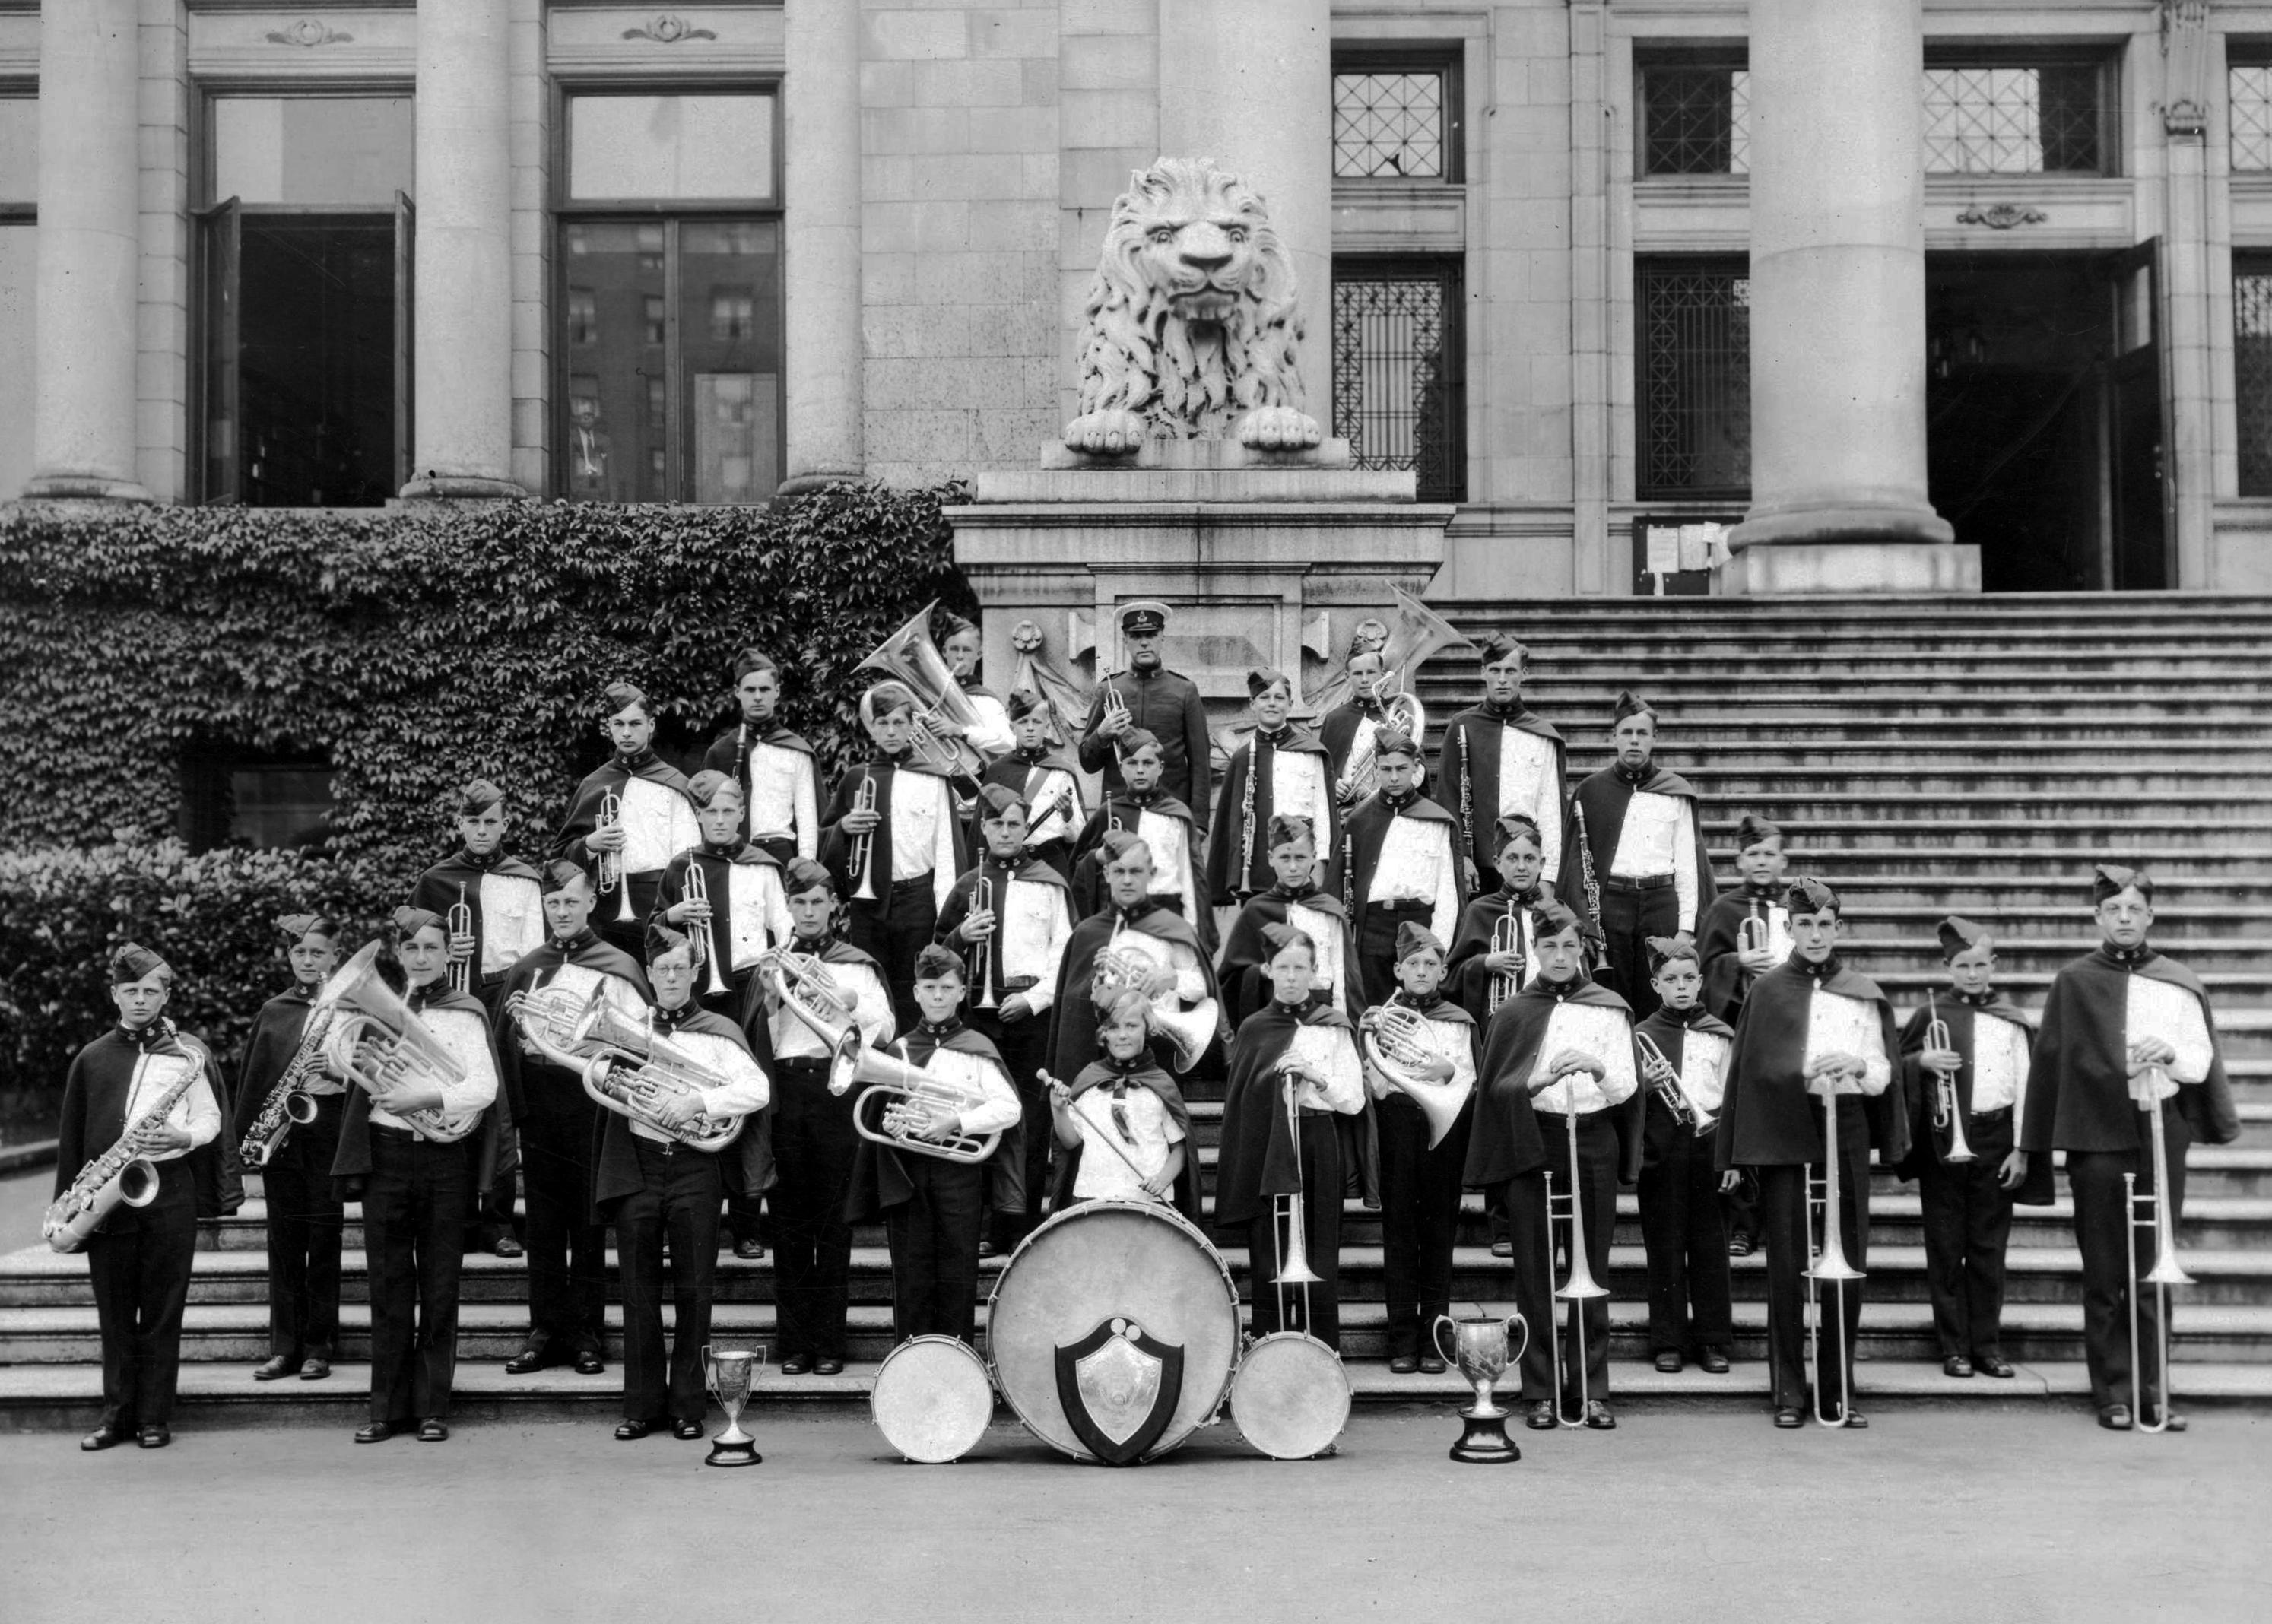 d1798kitshighschoolboysband1928